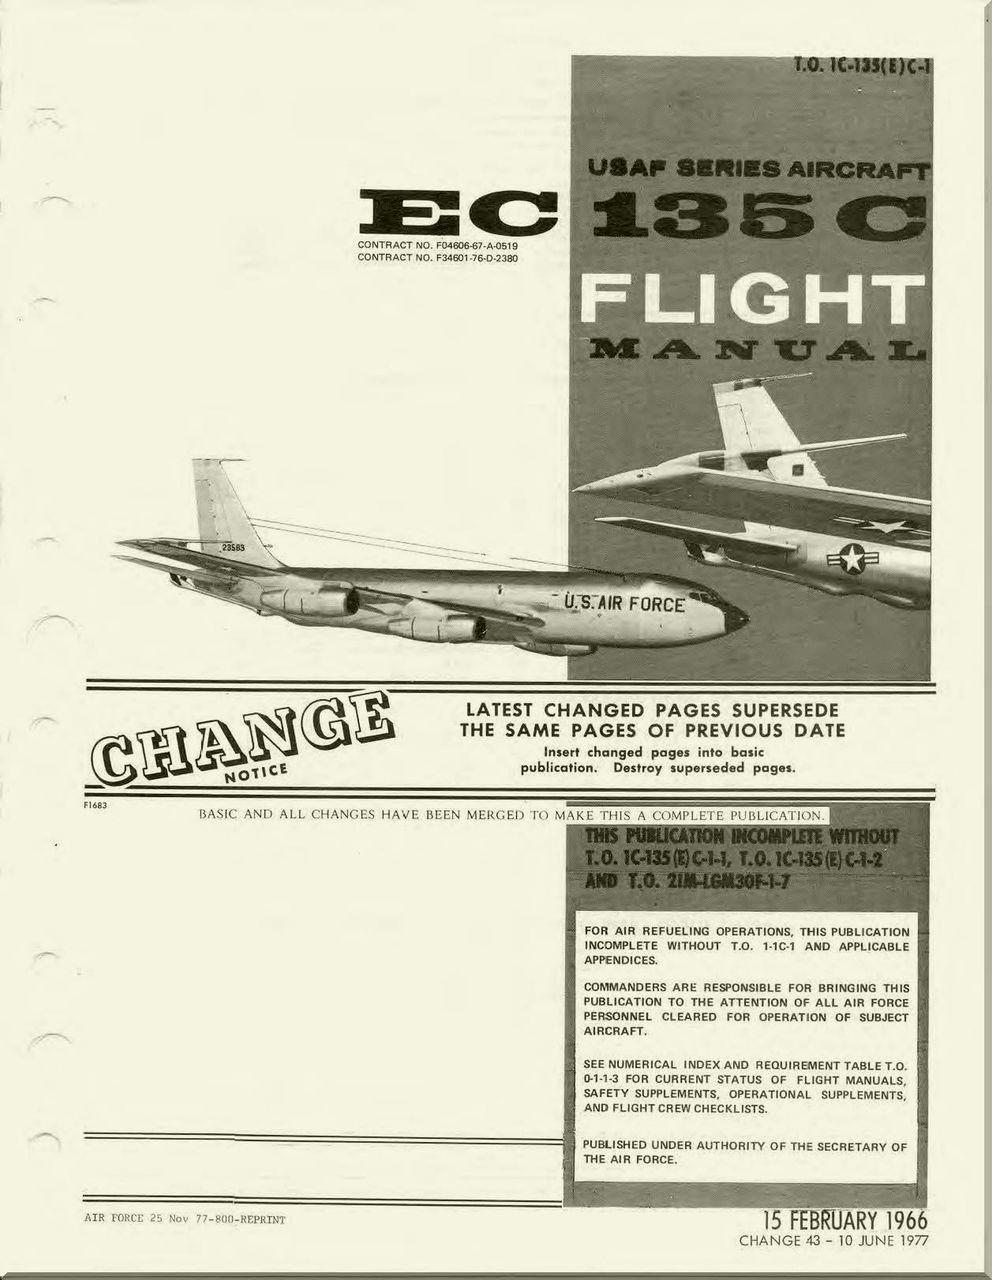 boeing ec 135c aircraft flight manual t o 1c 135 e c1 1966 rh pinterest co uk Boeing 717 Boeing 777